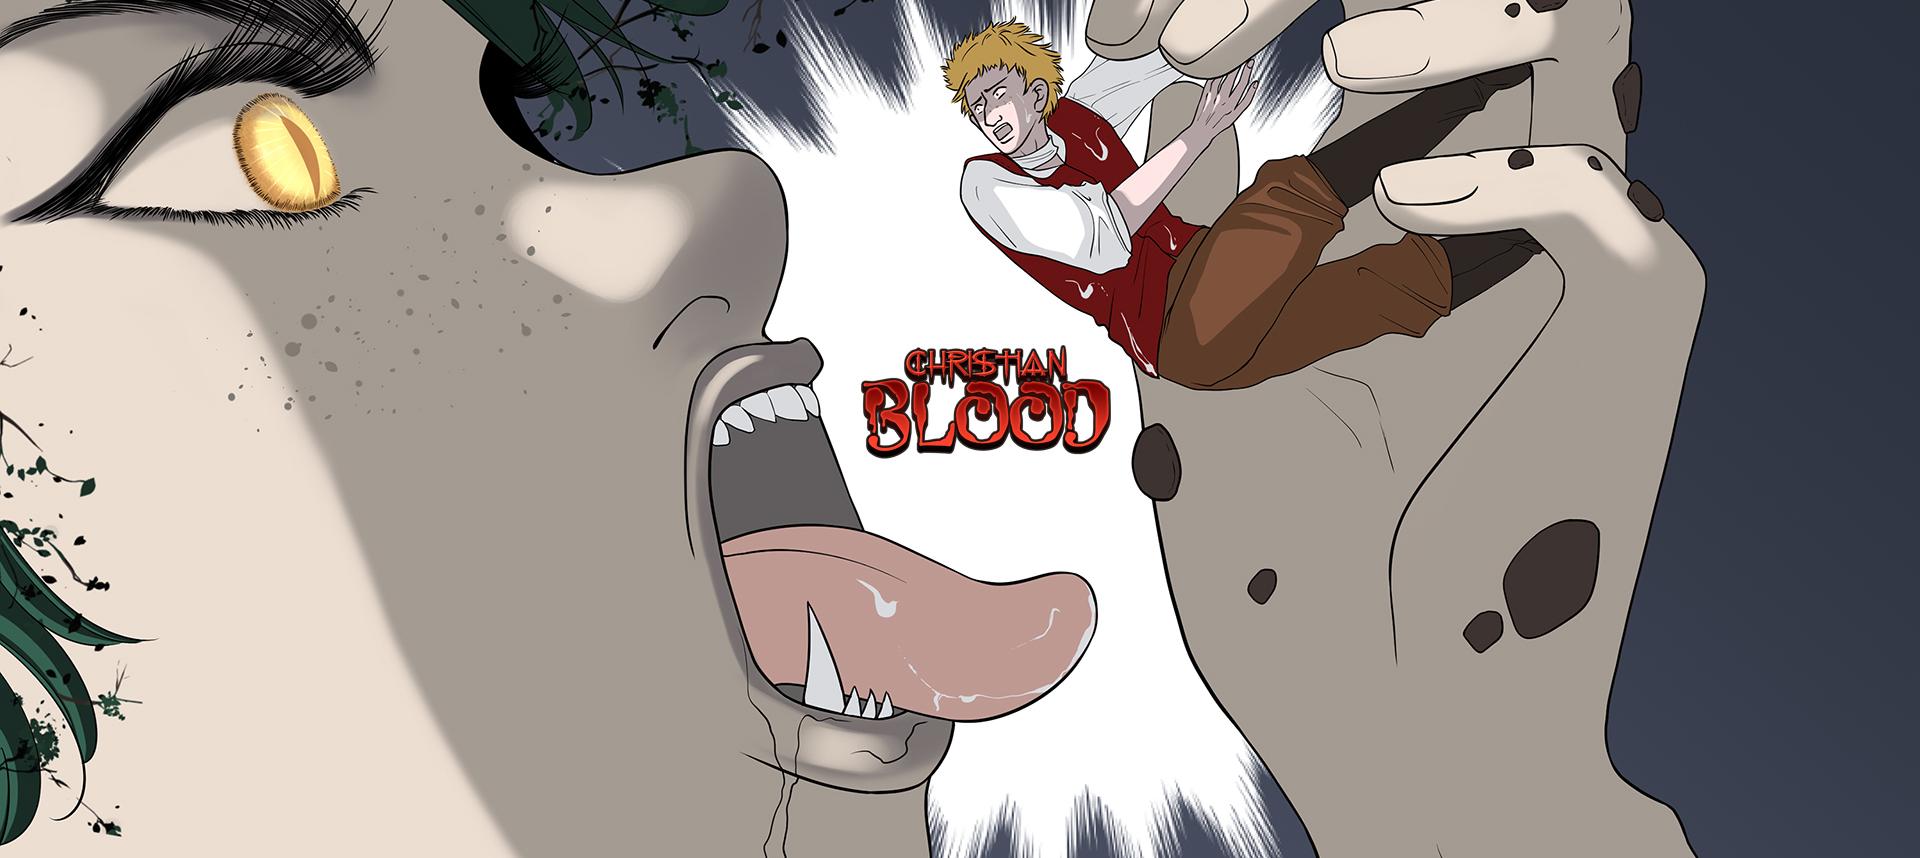 Christian-Blood_01-SLIDEa